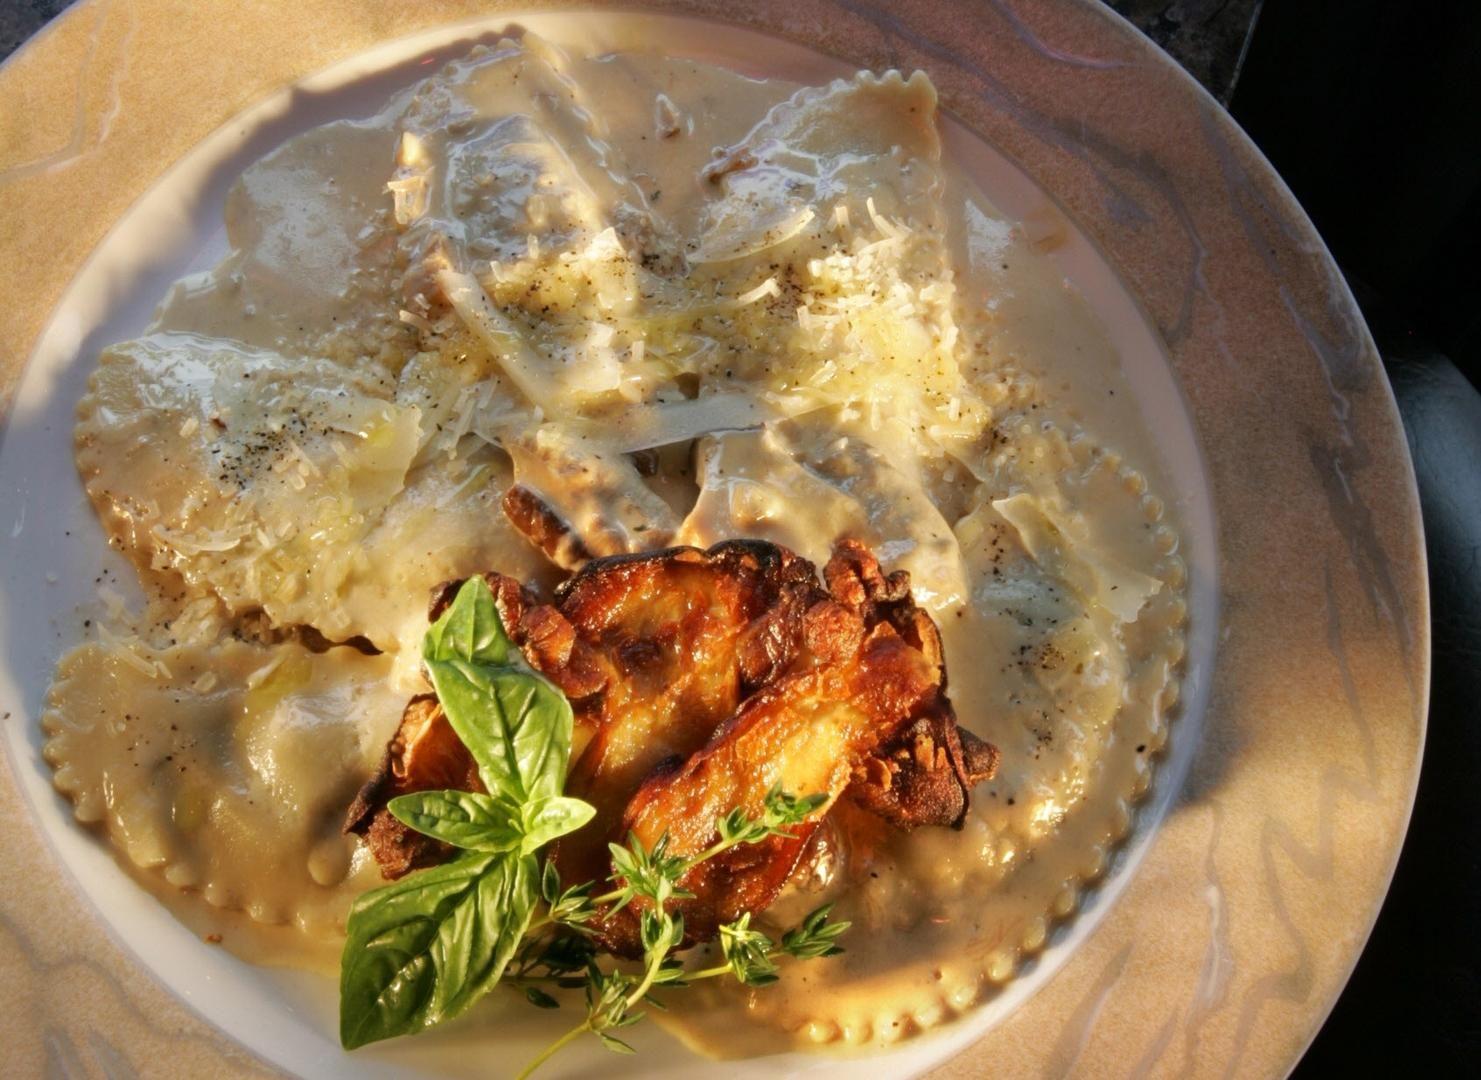 Throwback Thursday: Mediterraneo's Portobello Mushroom Agnolotti in Porcini Cream Sauce - Entertainment & Life - providencejournal.com - Providence, RI